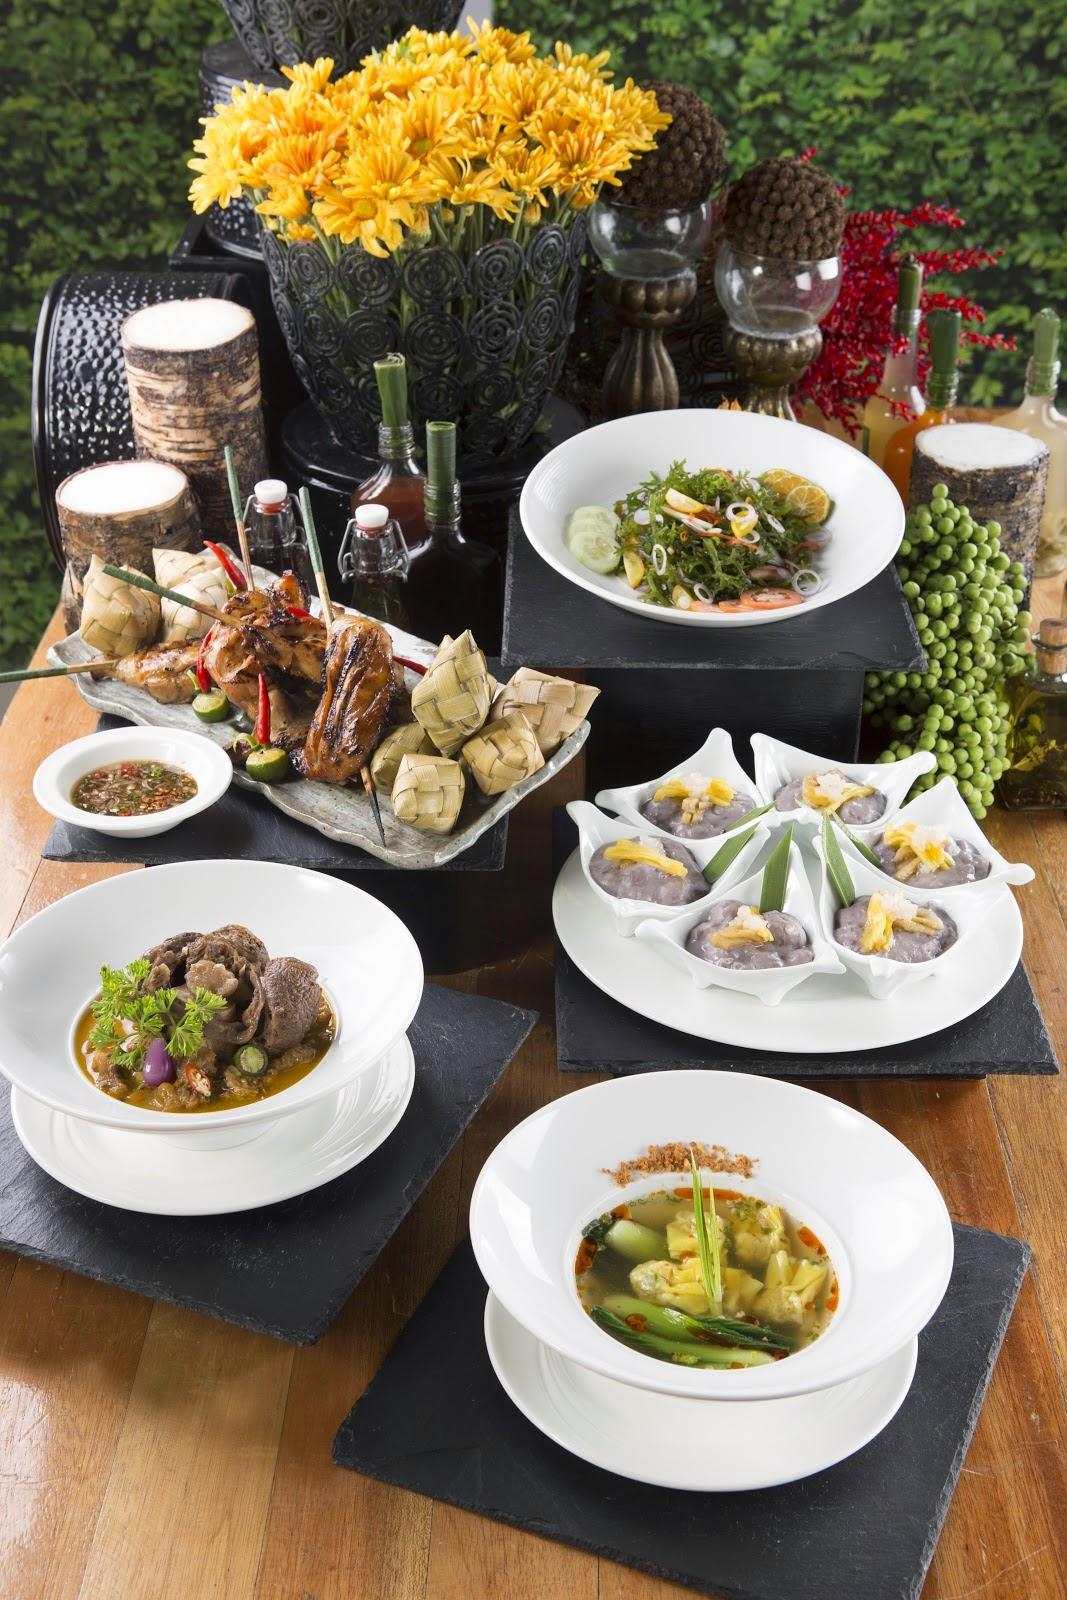 Midas Hotel's Sabroso! Food Festival: An Affair of Filipino